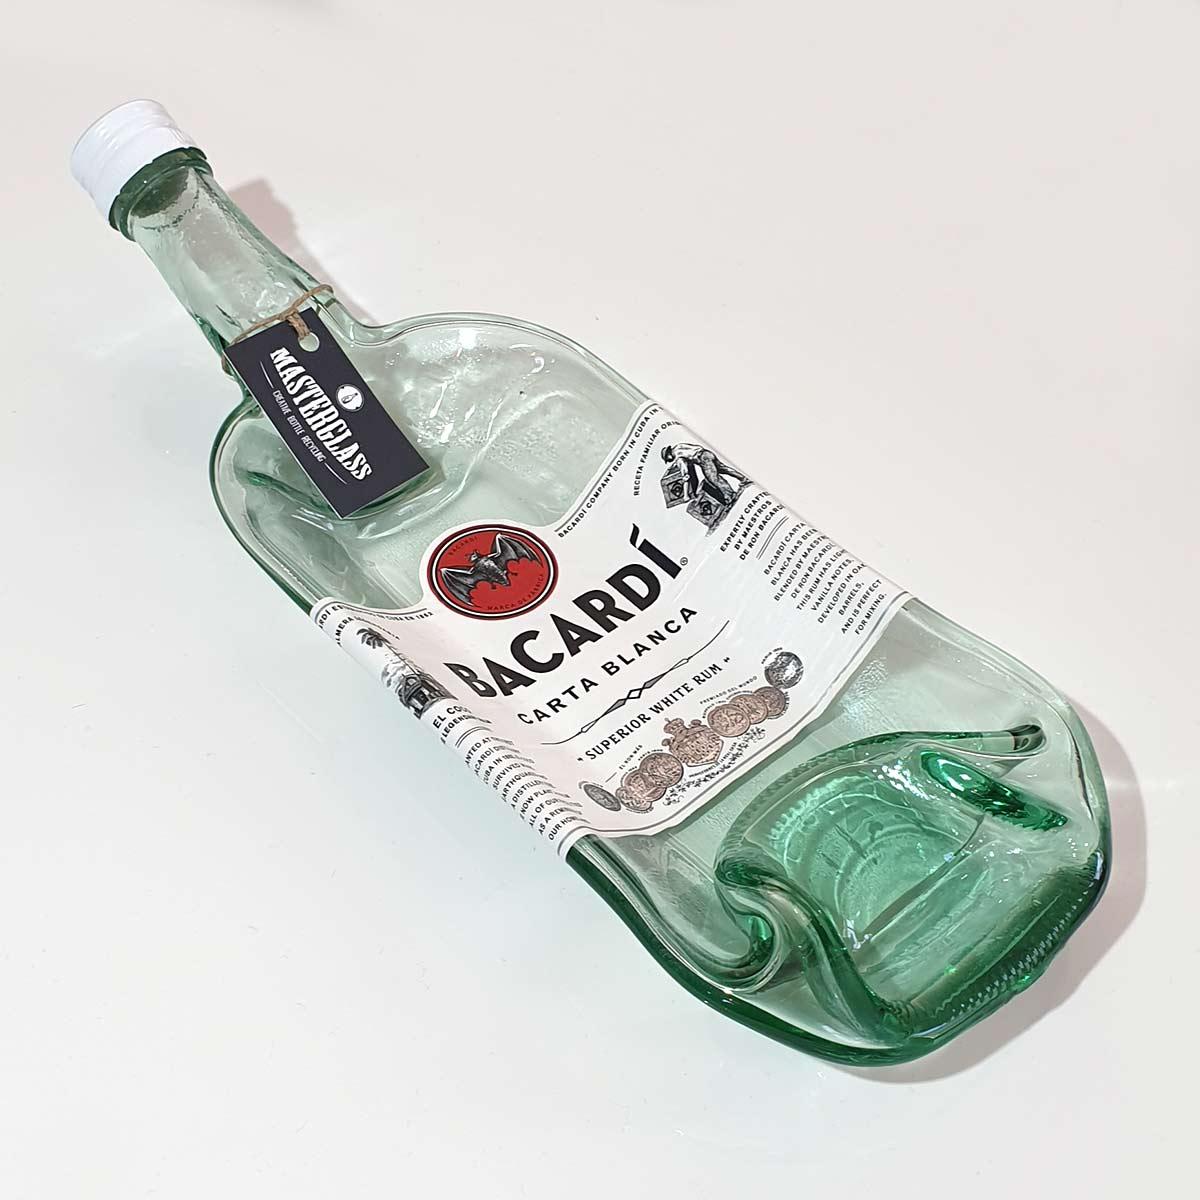 Tot borrelplank gesmolten fles Bacardi